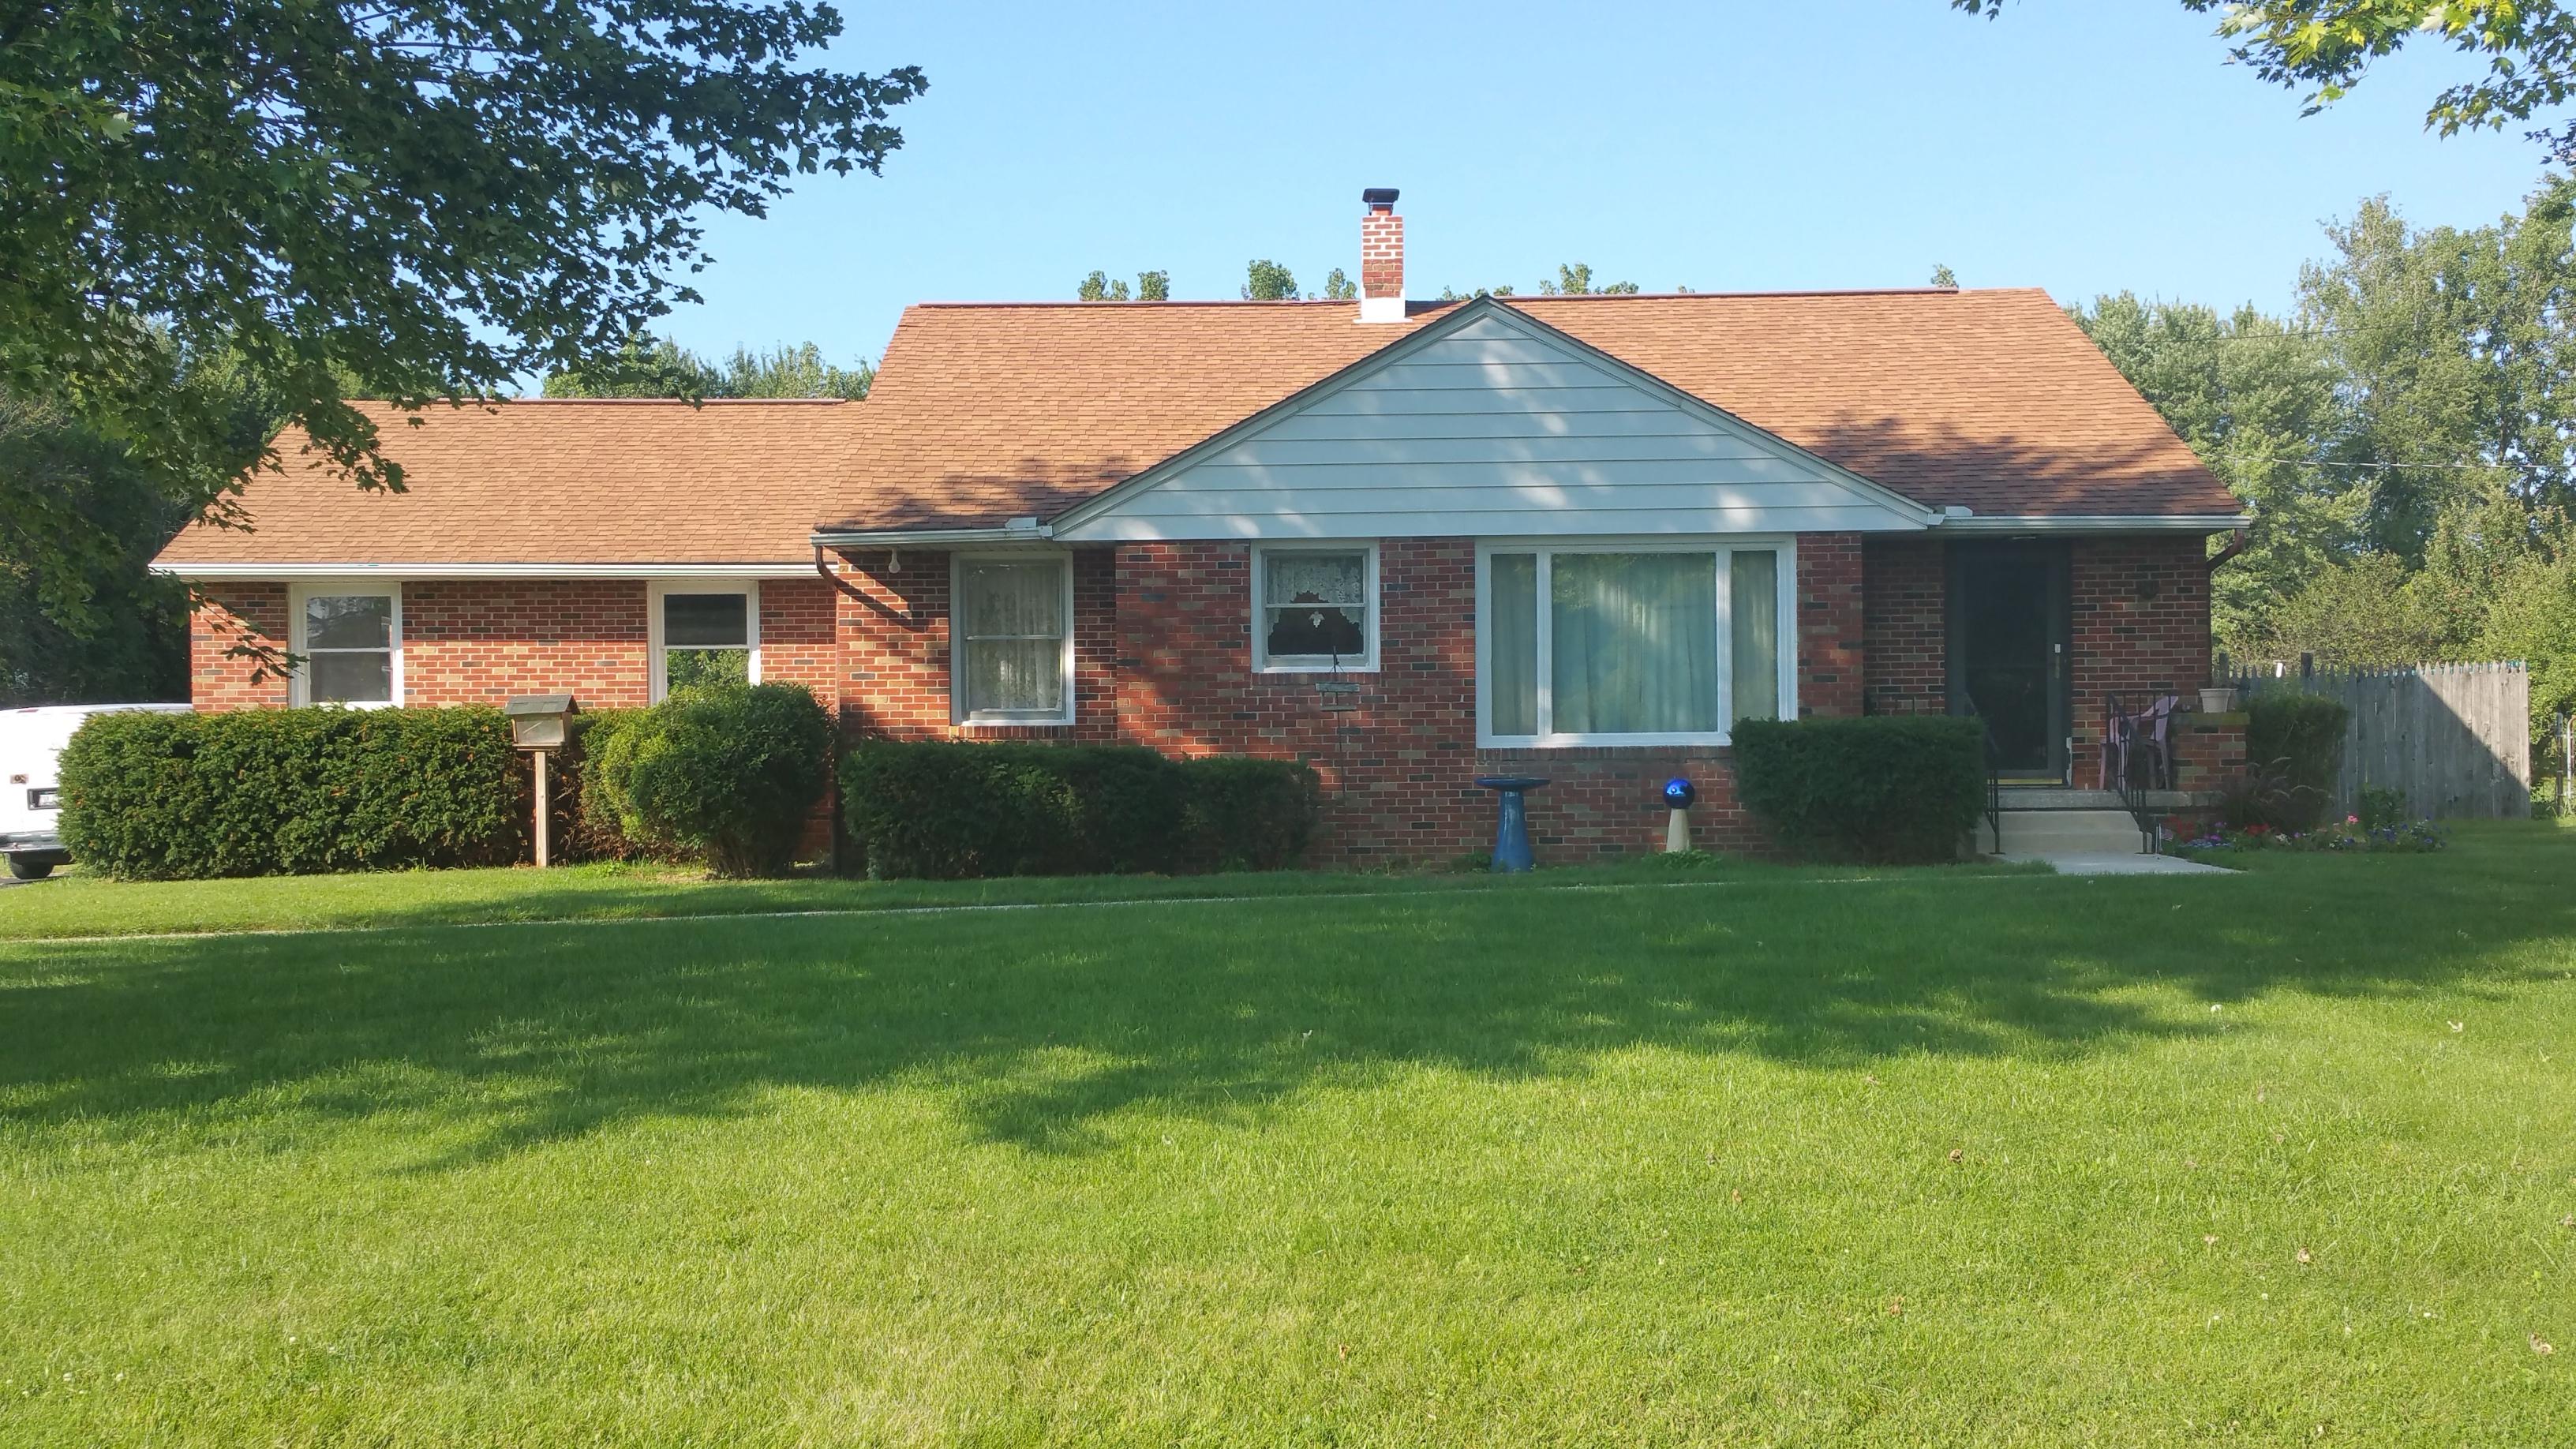 141 E. HIGH STREET, Edison, Ohio 43320